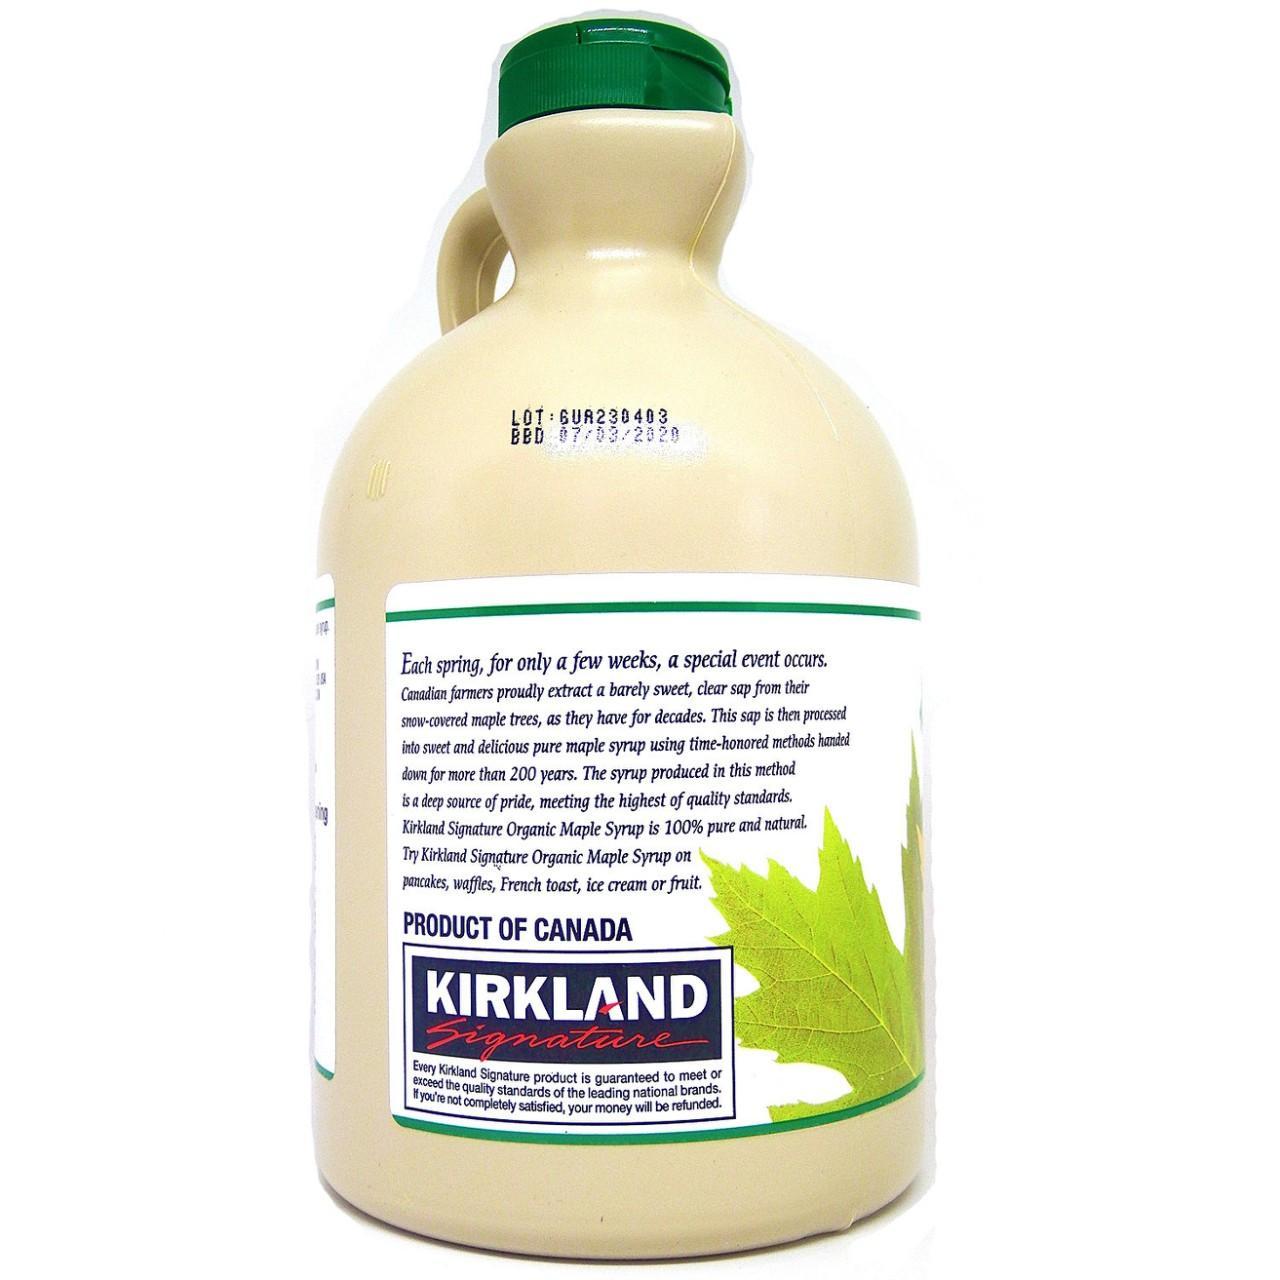 Kirkland Signature Organic Maple Syrup (1 liter)